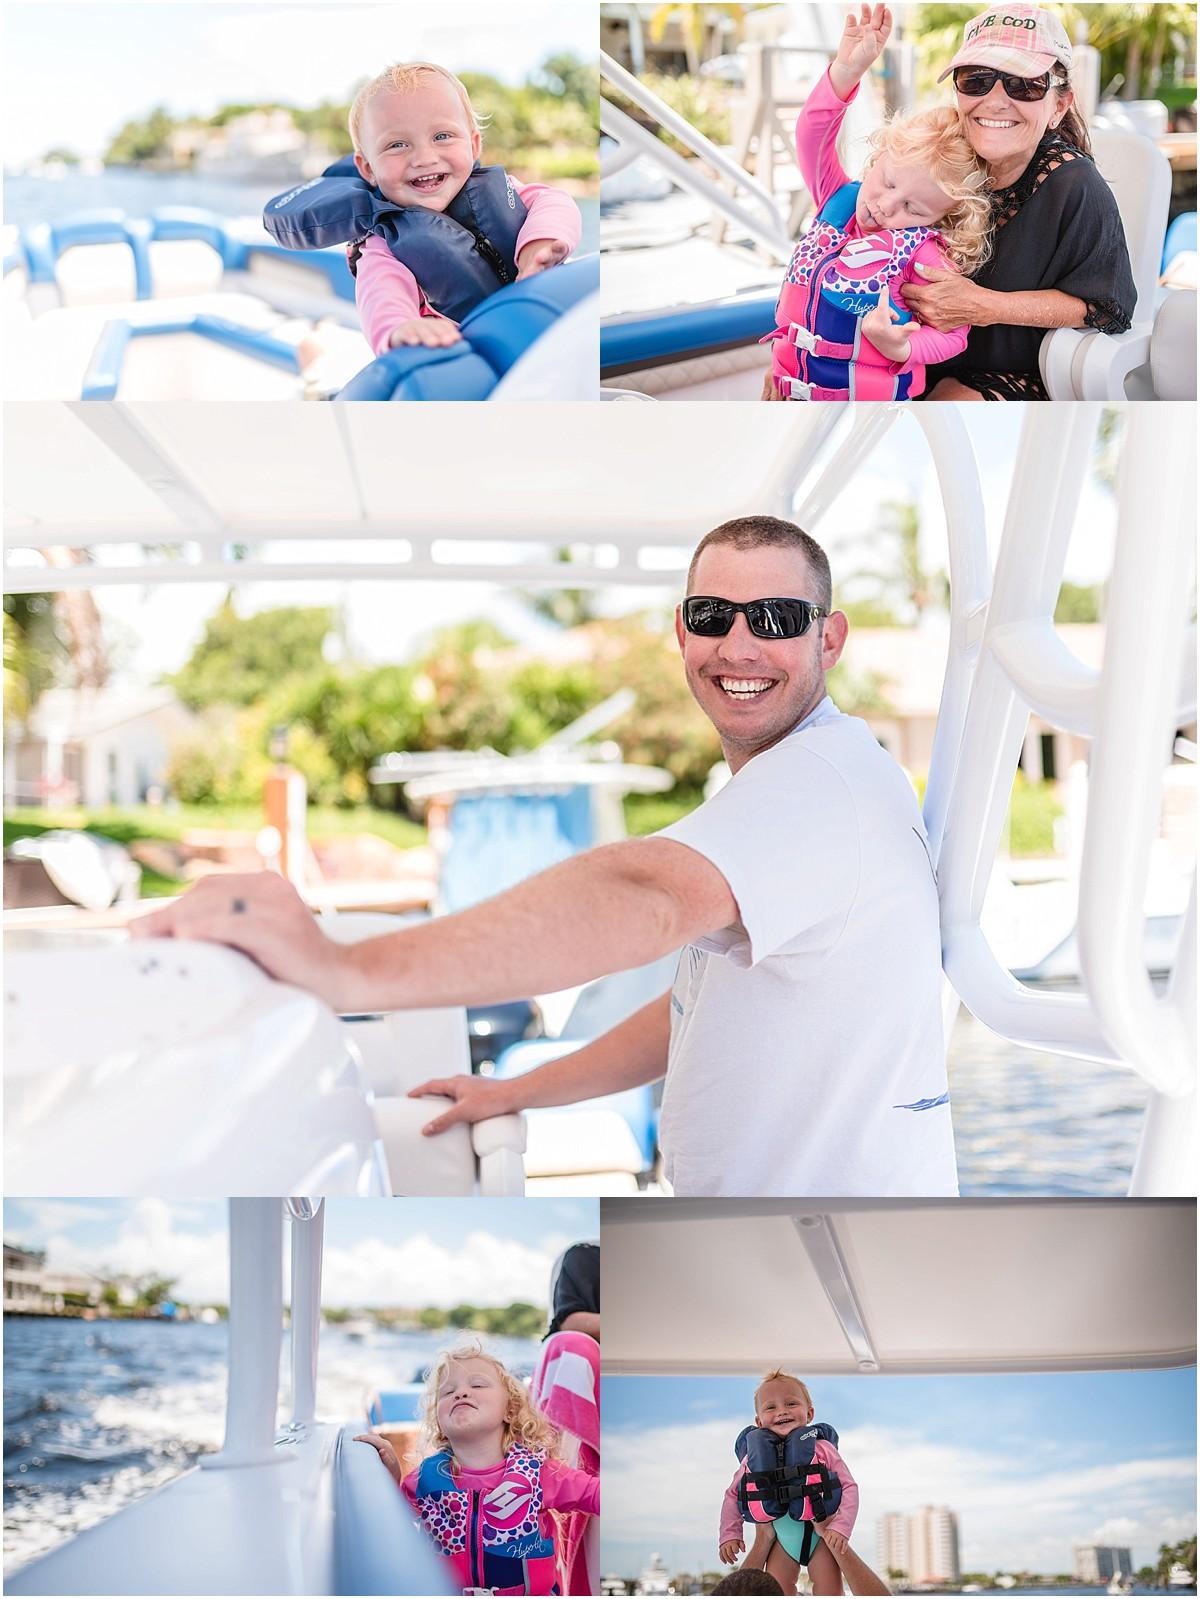 Ashley_Rogers_Photography_South_Florida_Photographer_Orlando_Photographer_Costa_Rica_Photographer_0791.jpg